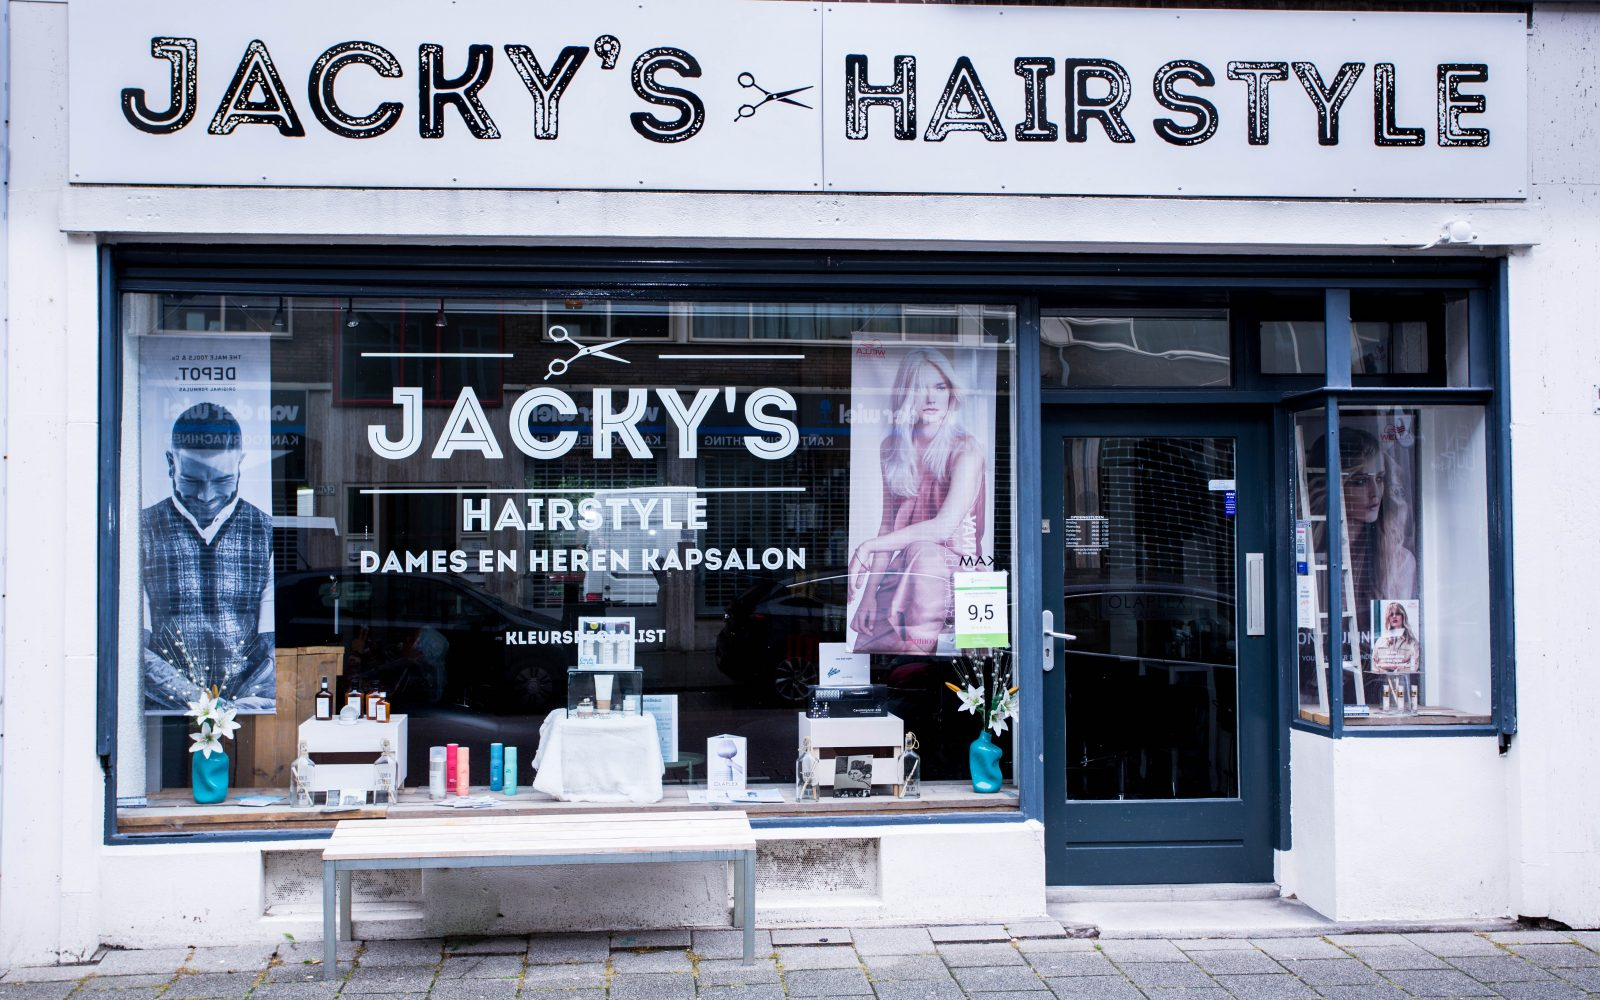 Jacky's Hairstyle op de Hoogstraat